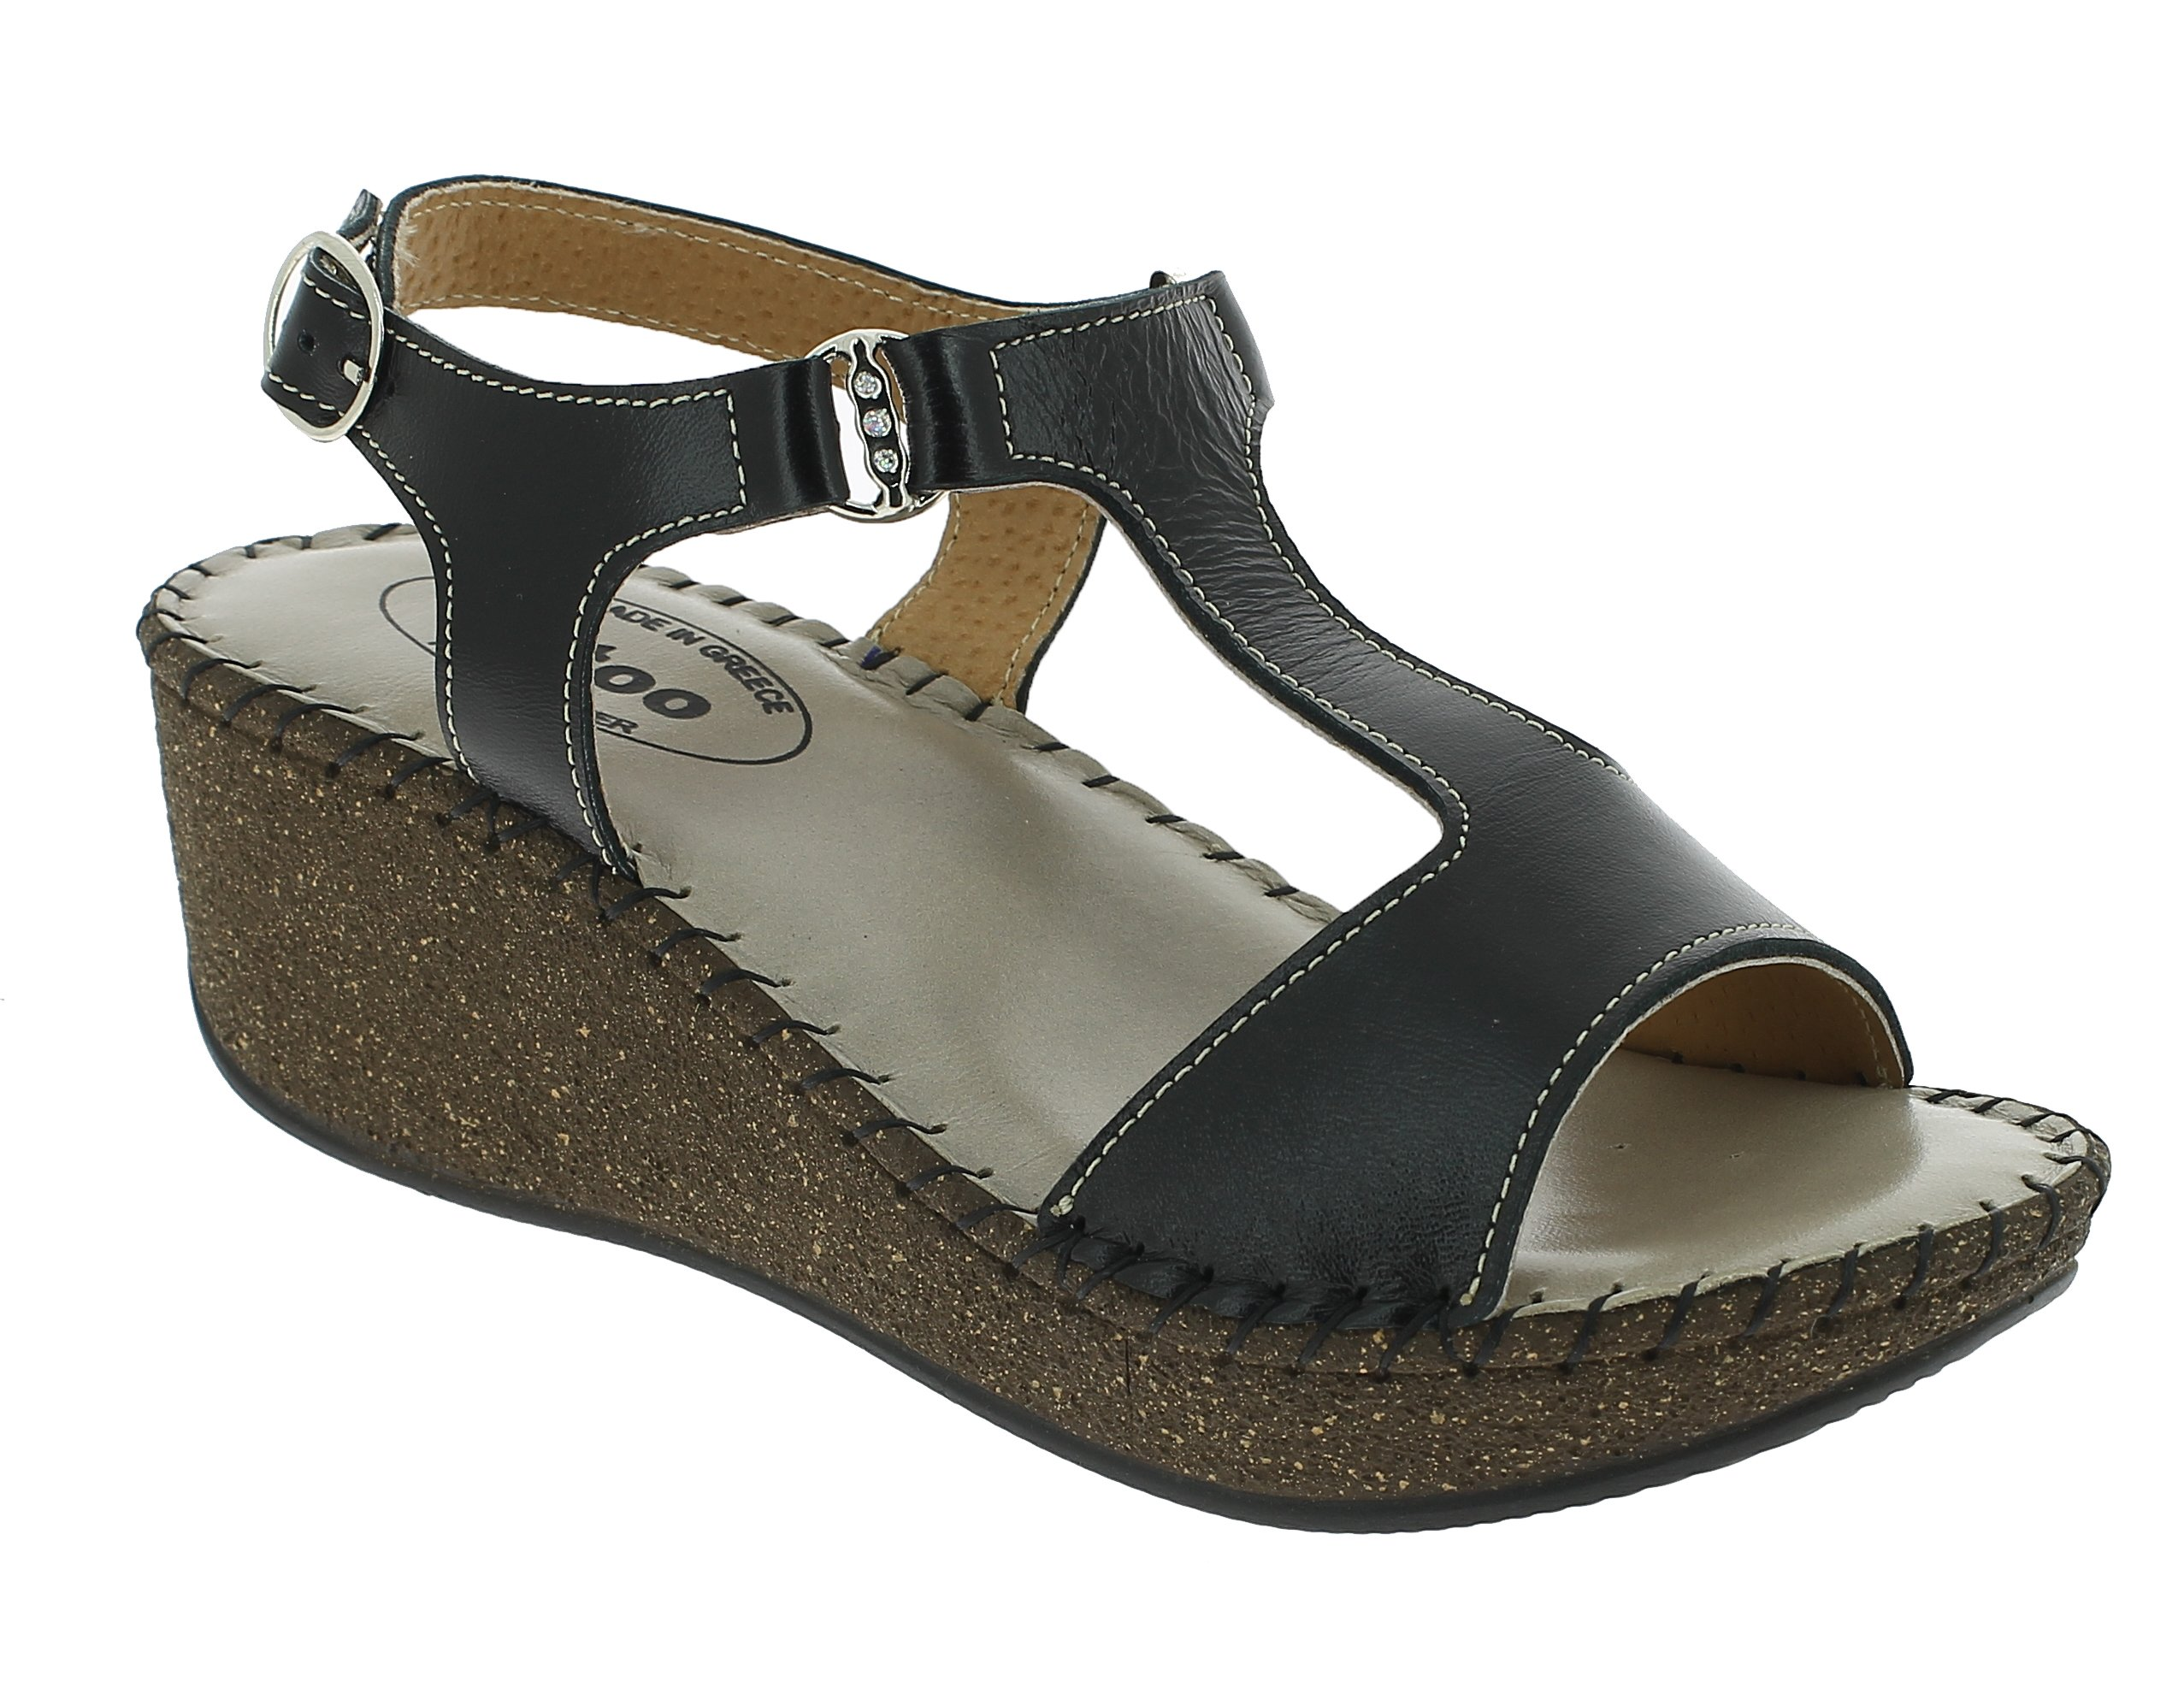 TATOO Γυναικείο Πέδιλο 4040 Μαύρο - IqShoes - 10.4040 black 37/1/15/27 παπούτσια  πέδιλα